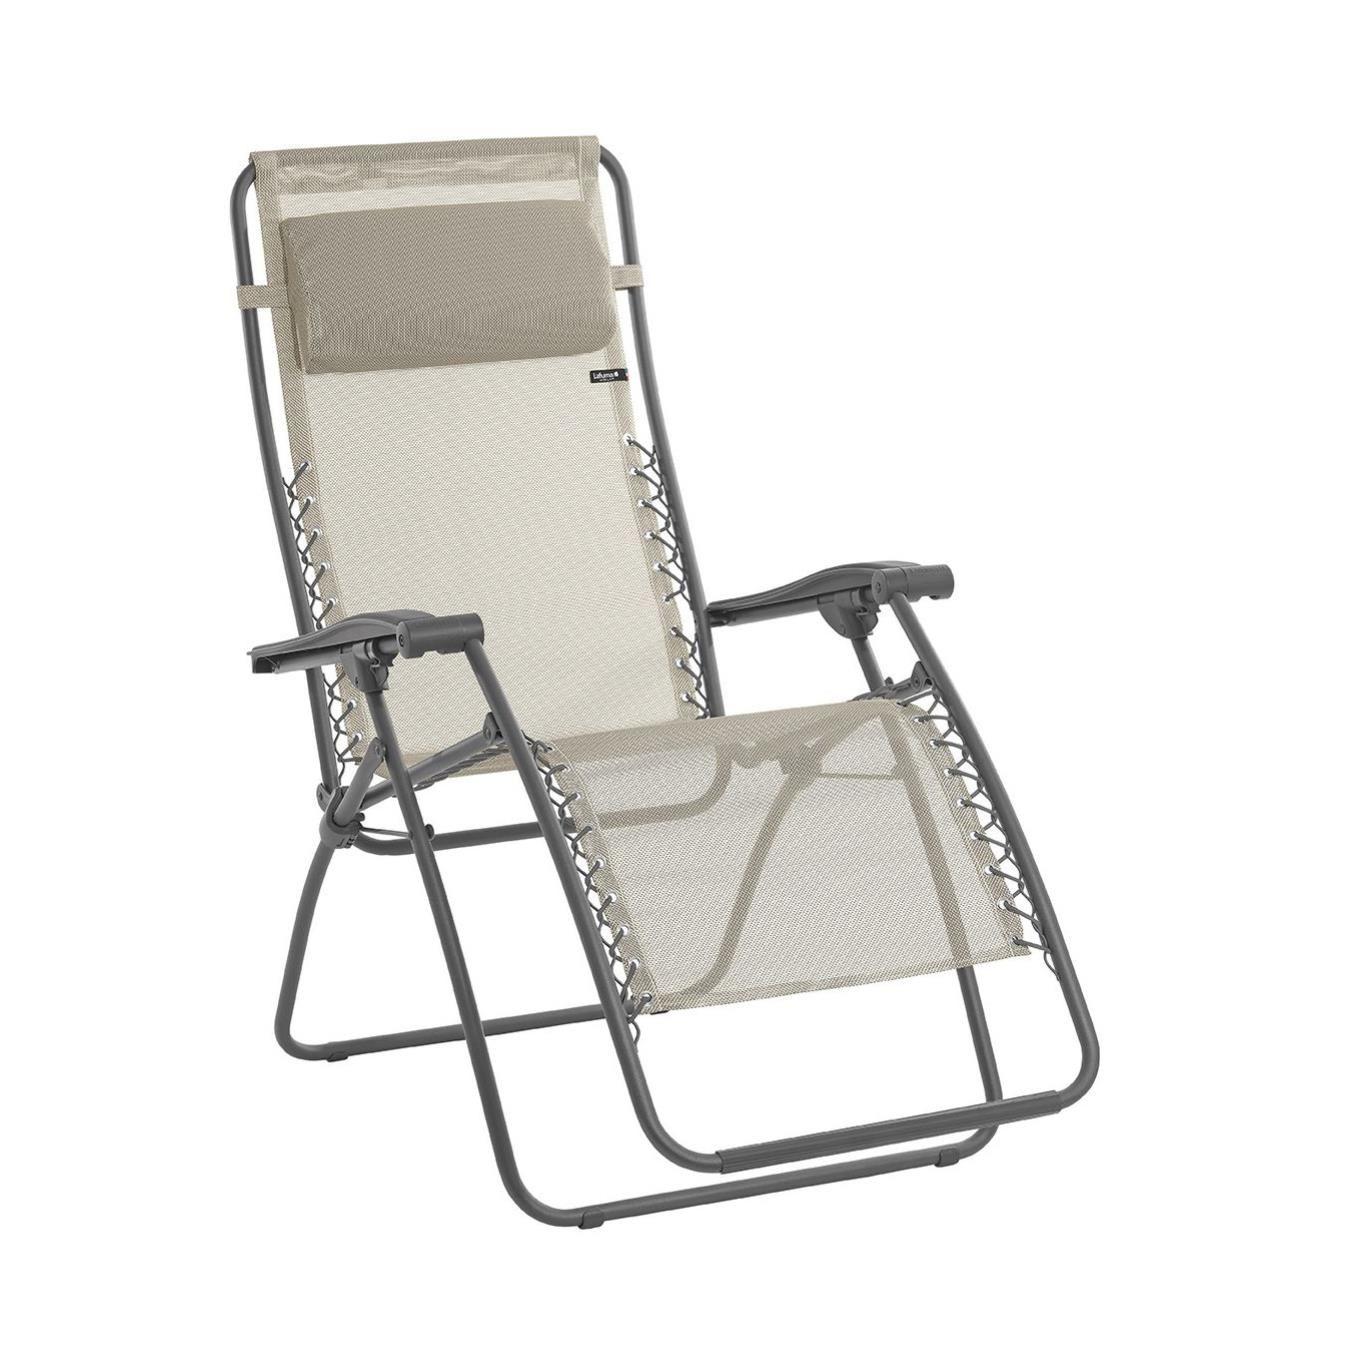 Xtend Angebote Lafuma RSXA Batyline® Relaxliege Grau: Category:  Campingmöbel U003e Campingliegen Item